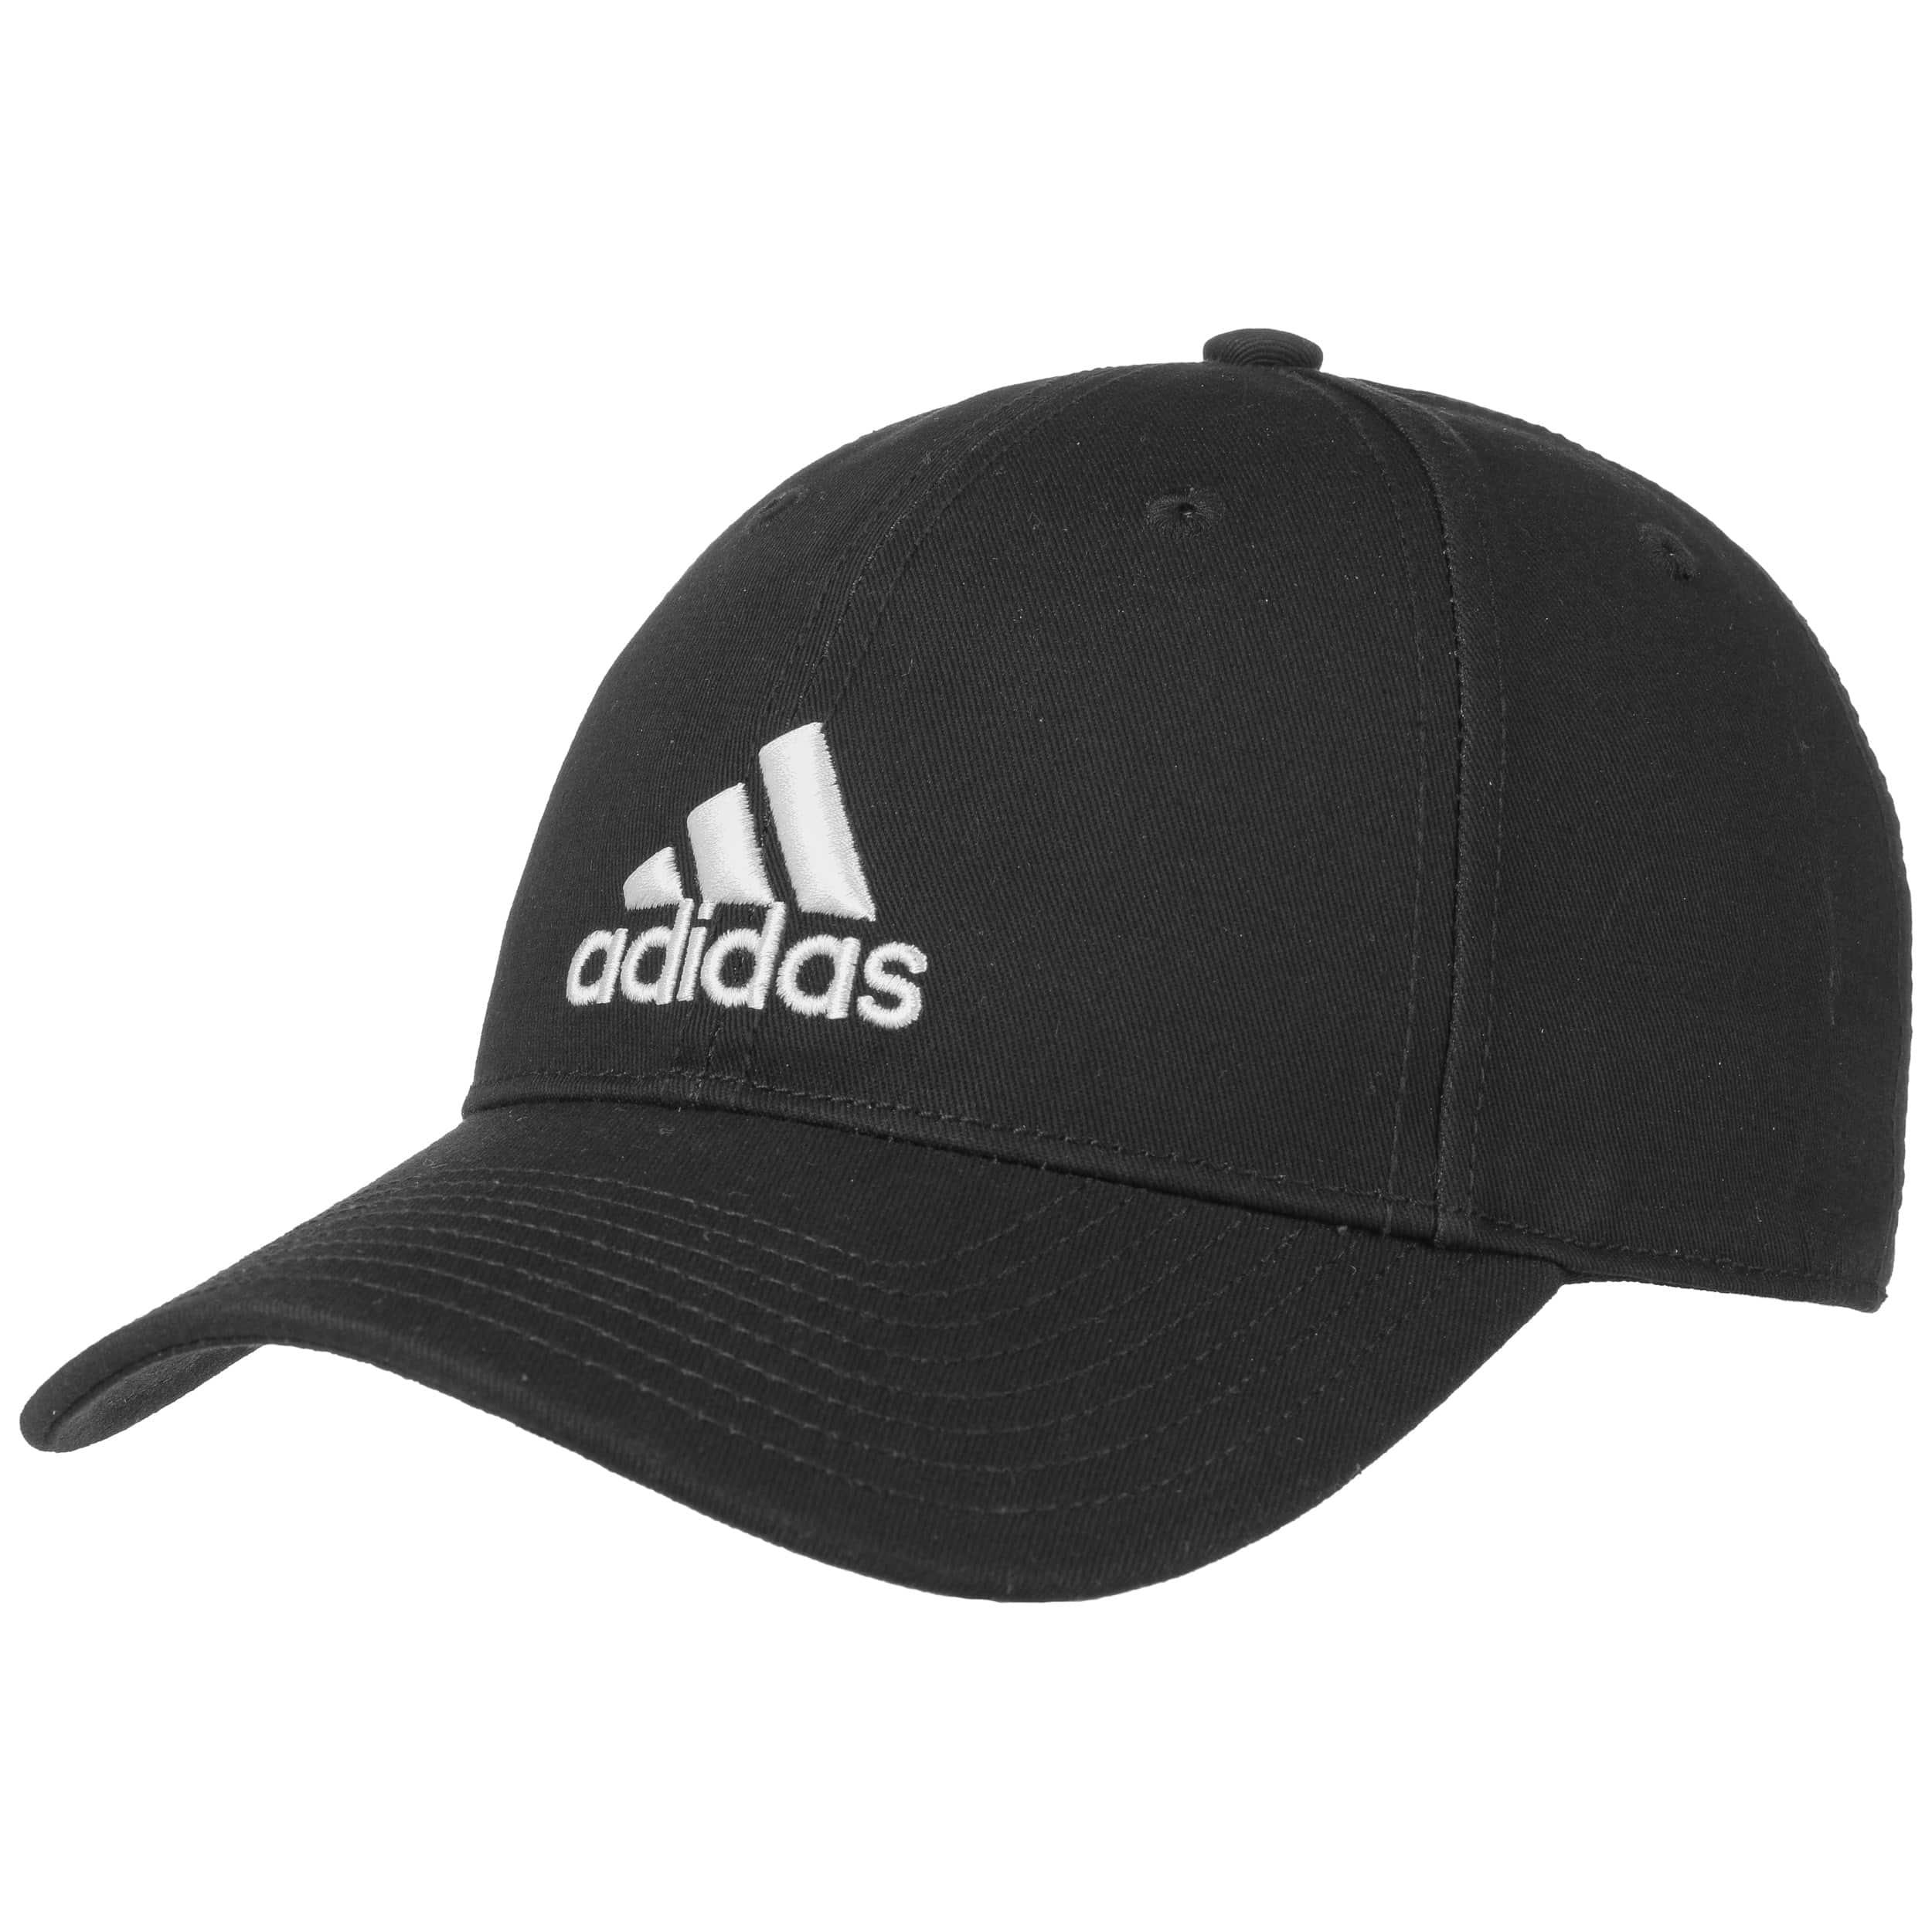 37499d871dfe2 Gorra 6P Classic Cotton Snapback by adidas - Gorras - sombreroshop.es